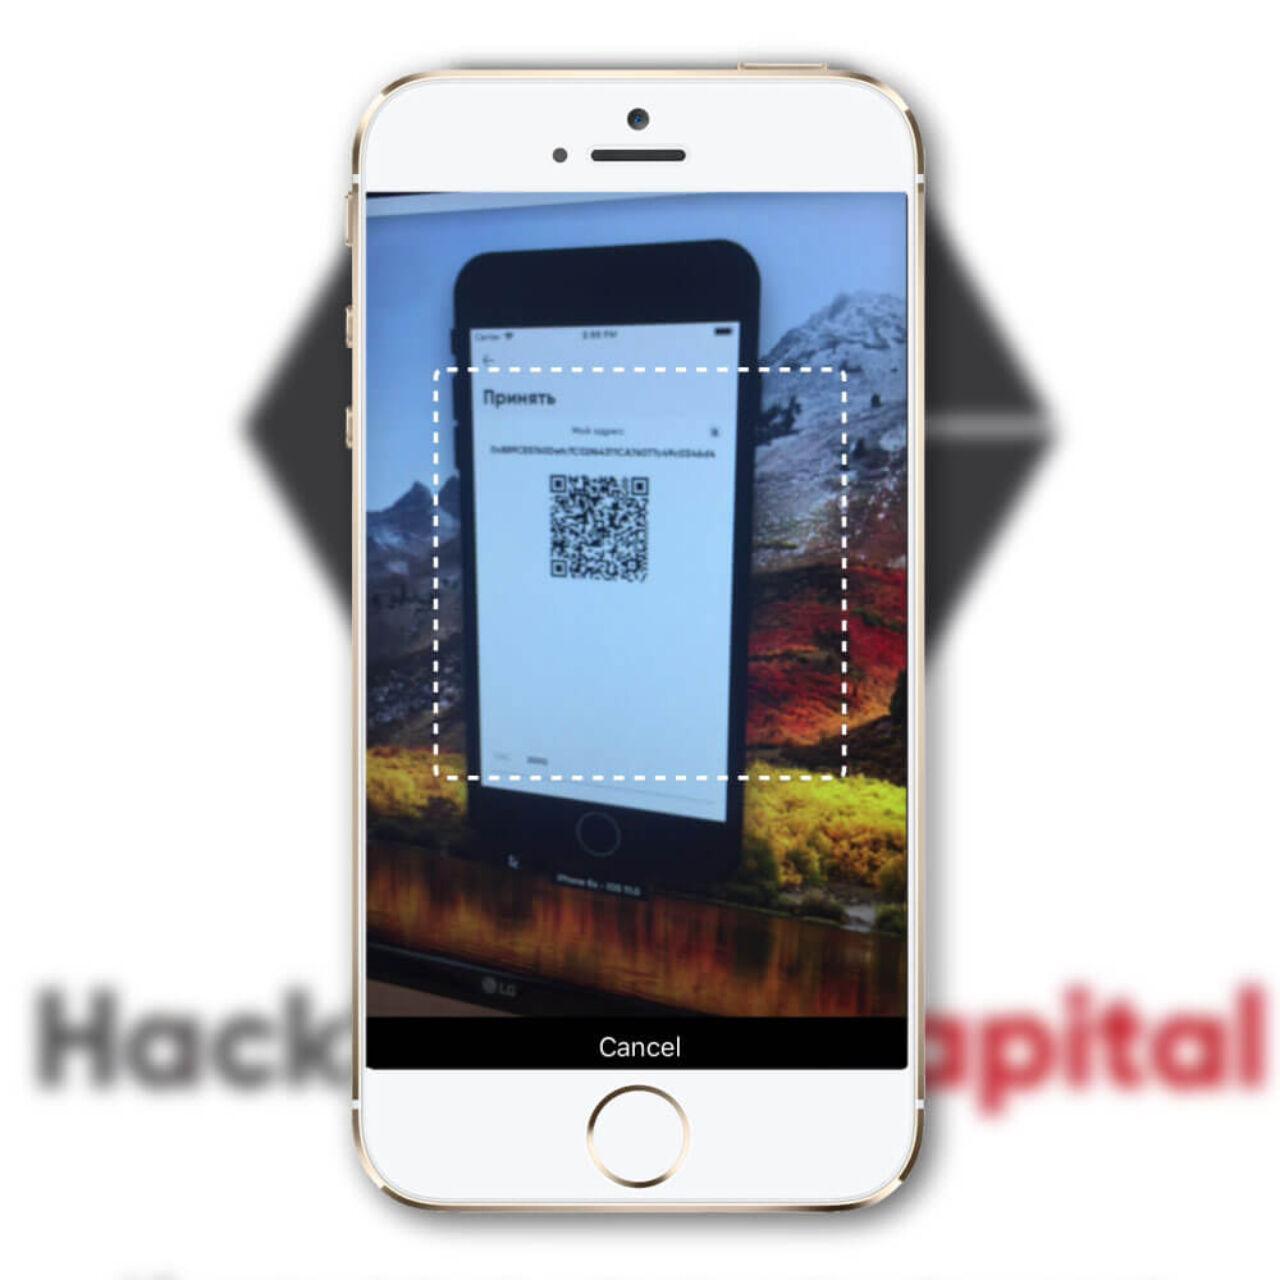 HSP token Wallet QR scanning